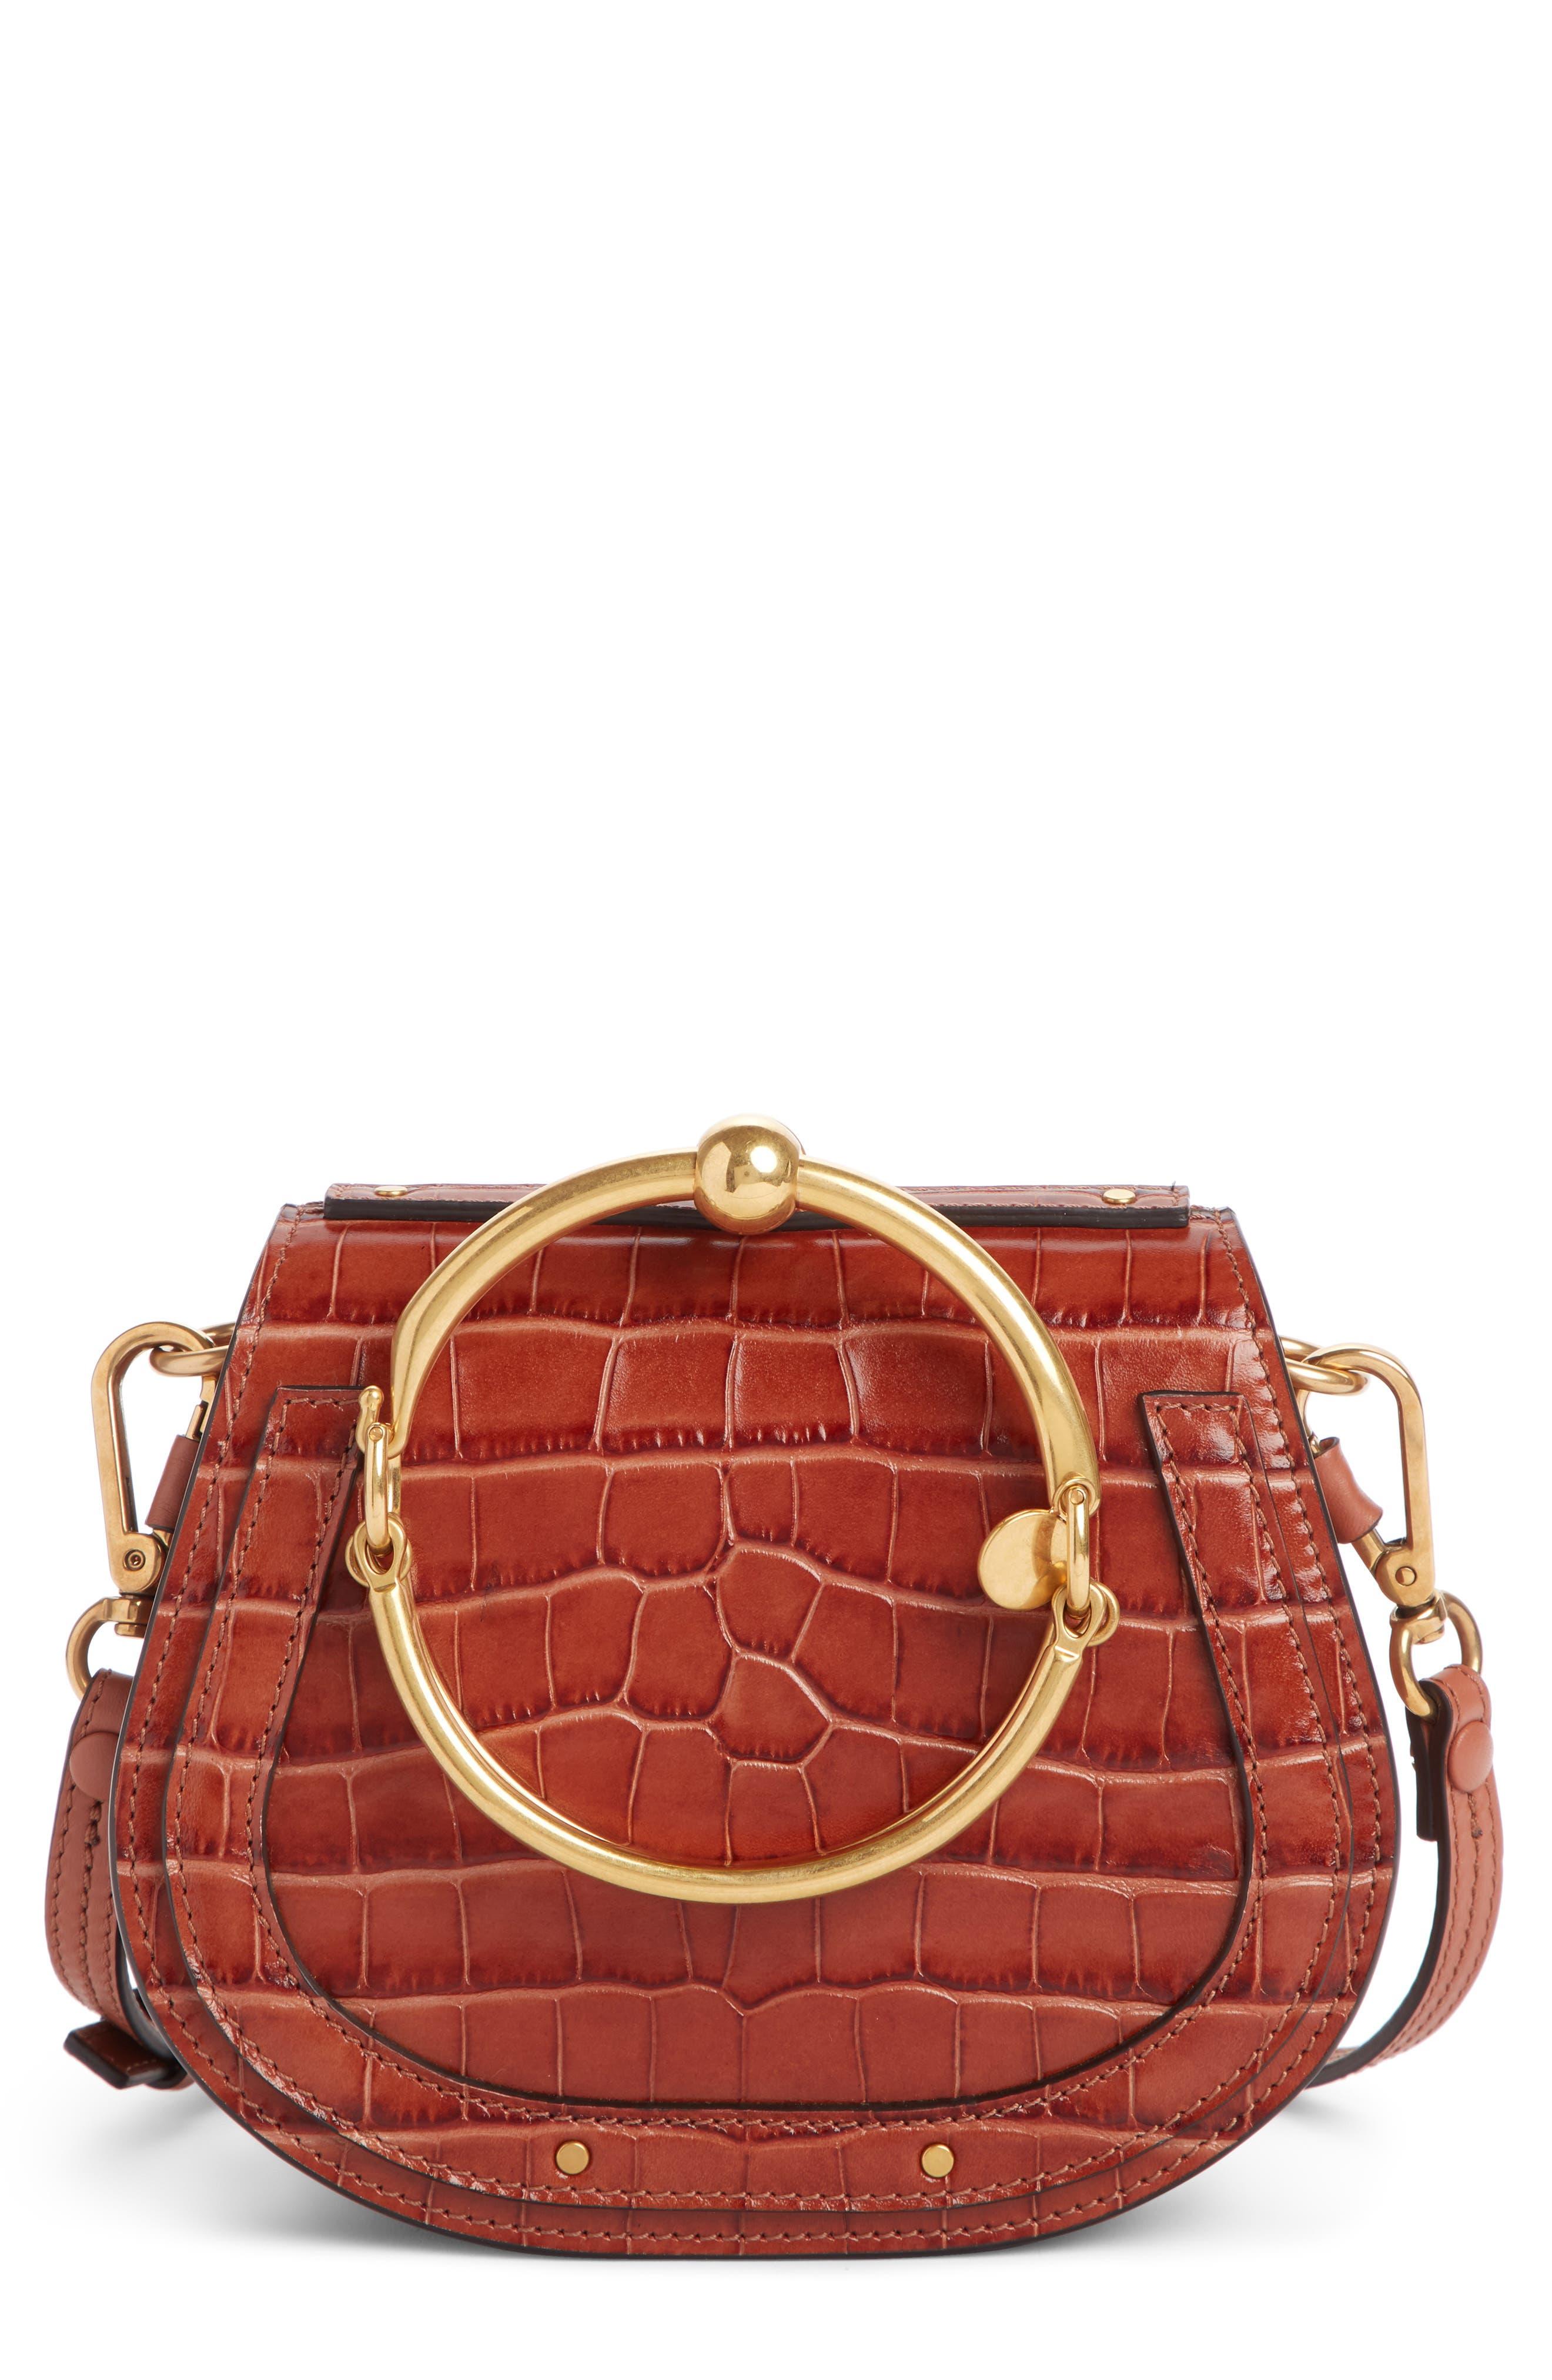 CHLOÉ Nile Bracelet Croc Embossed Leather Crossbody Bag, Main, color, CHESTNUT BROWN